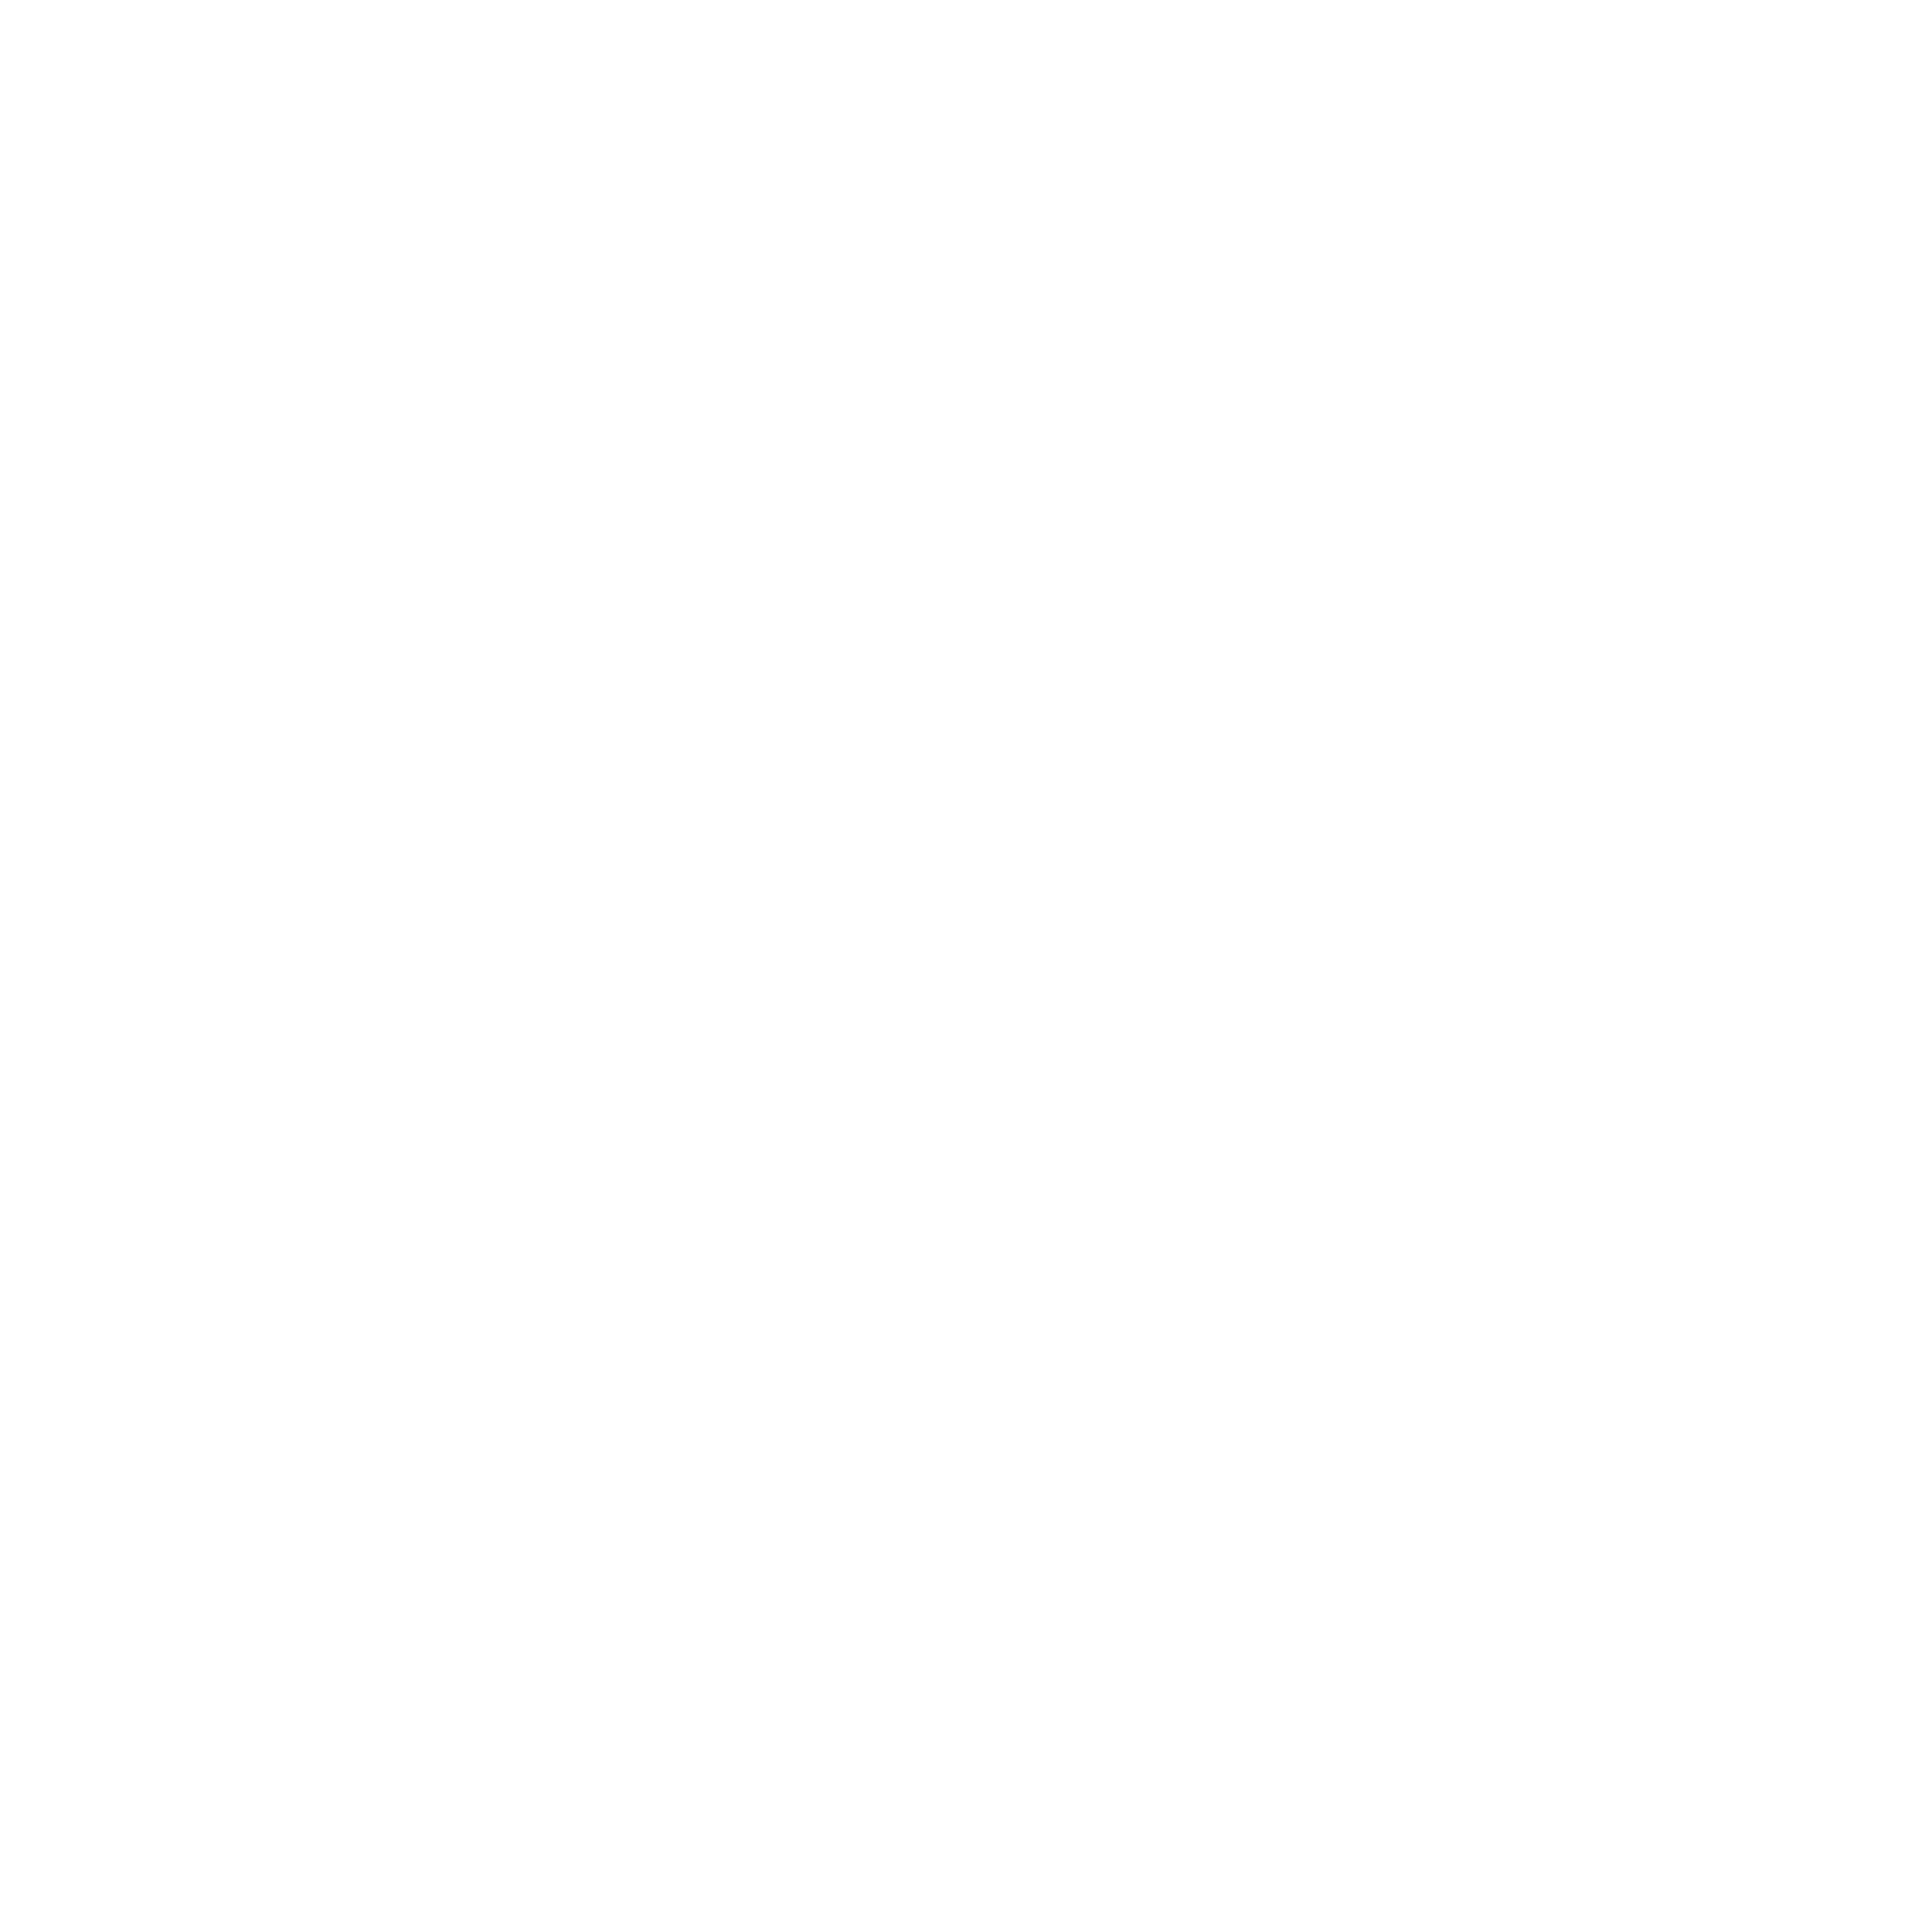 004-a2